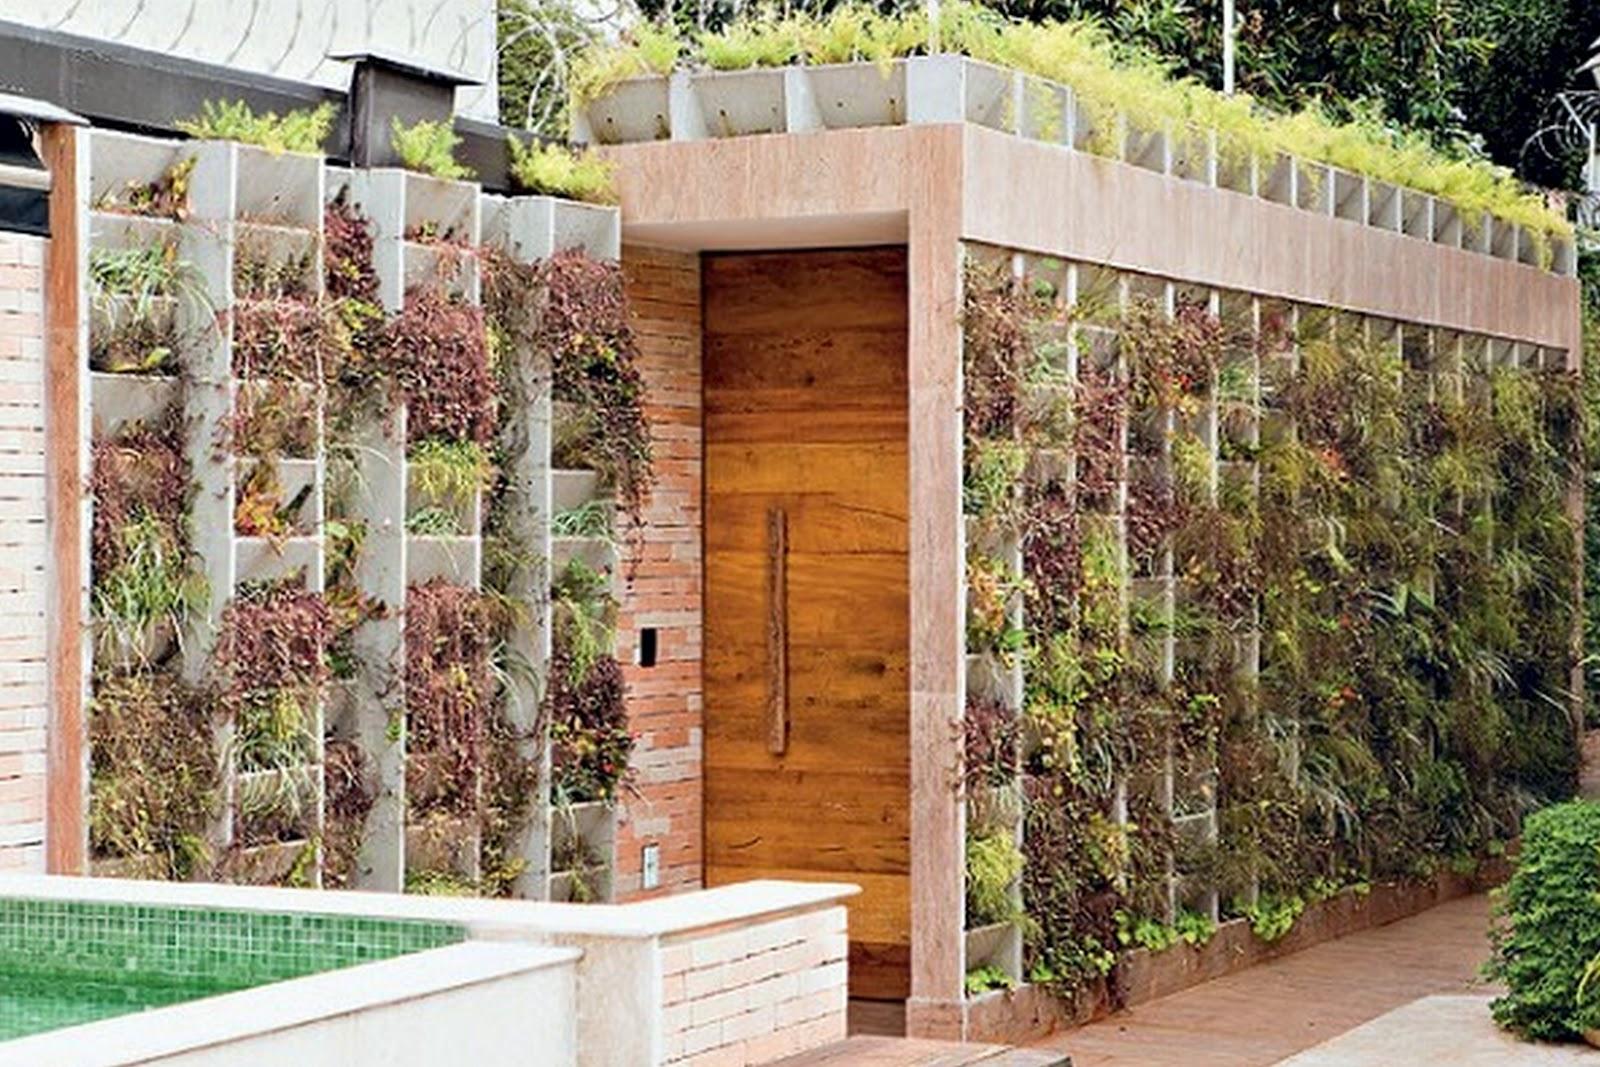 jardim vertical lisboa:segunda-feira, 20 de agosto de 2012